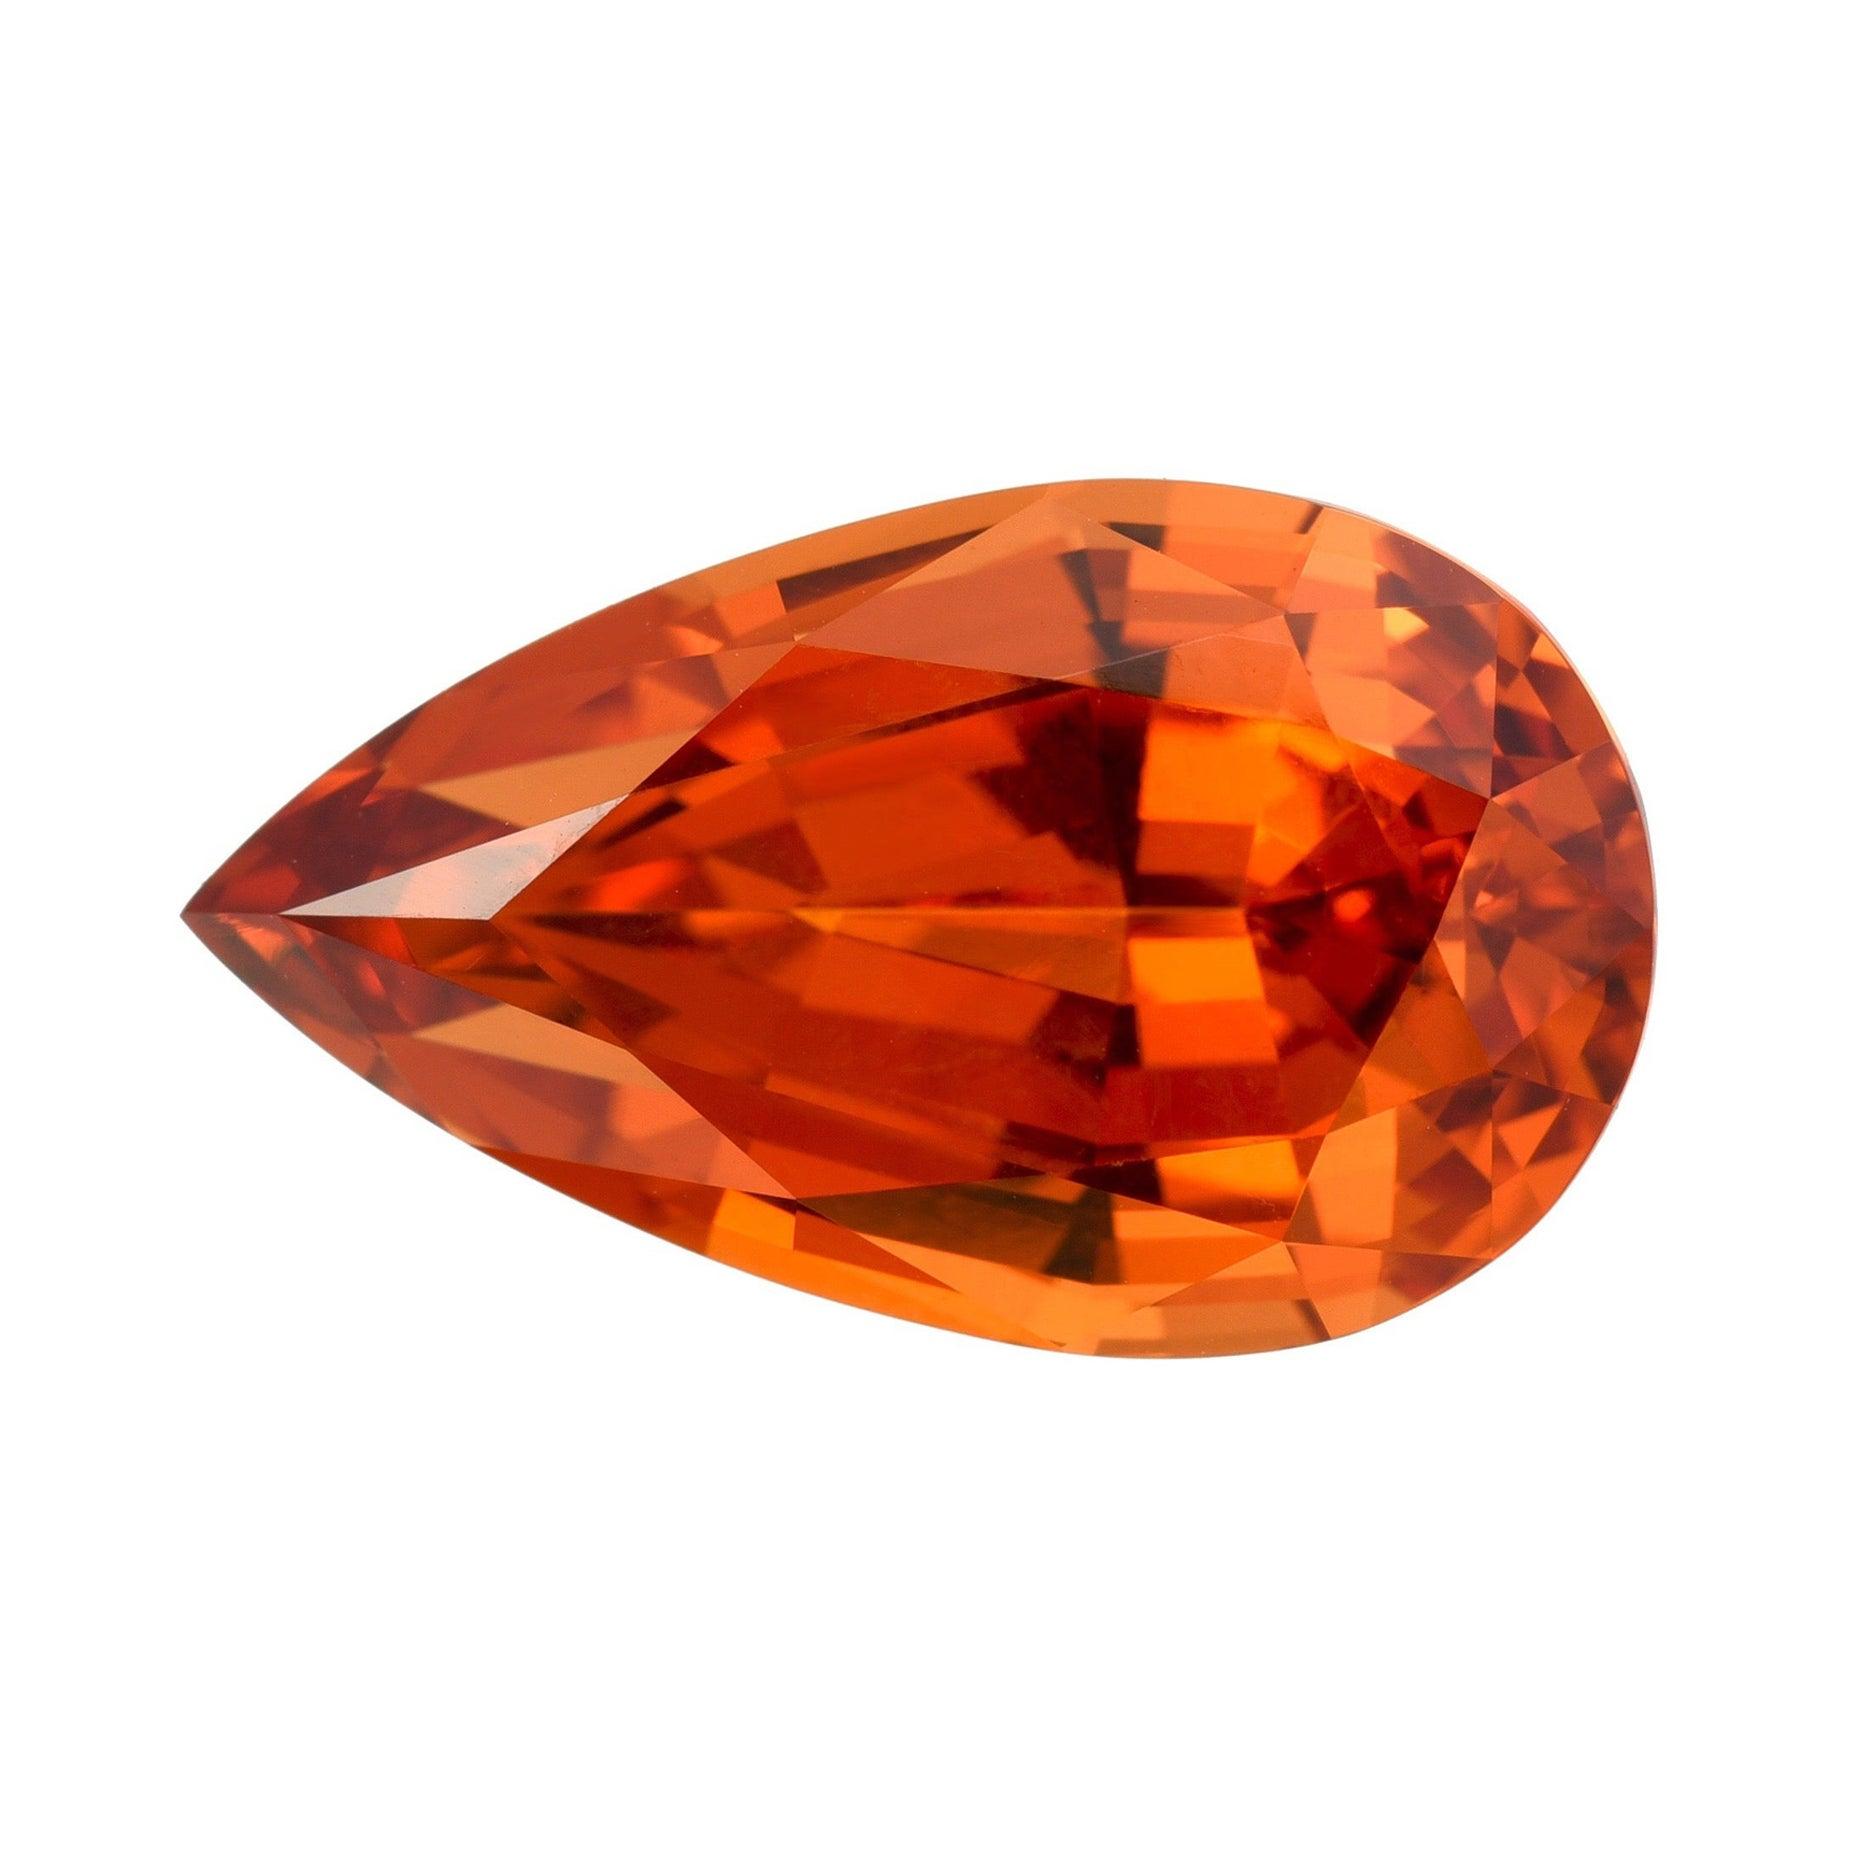 Mandarin Garnet Ring Necklace Gem 10.98 Carat Pear Shape Loose Gemstone